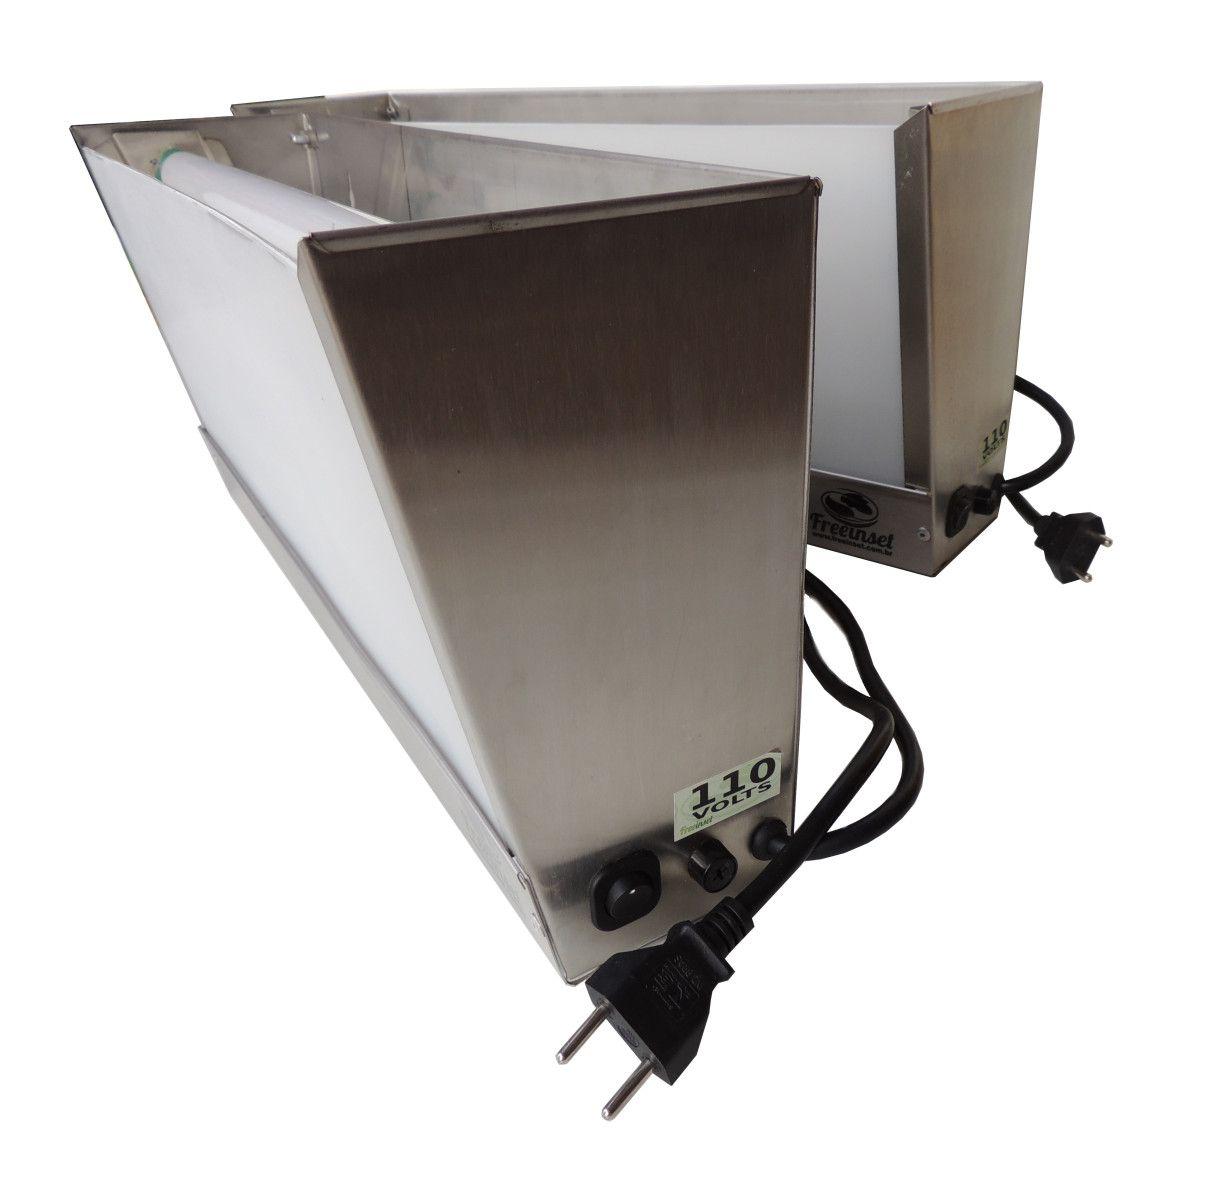 Armadilhas Luminosas TOP, 30w, até 50m², Bivolt, Aço Inox Escovado